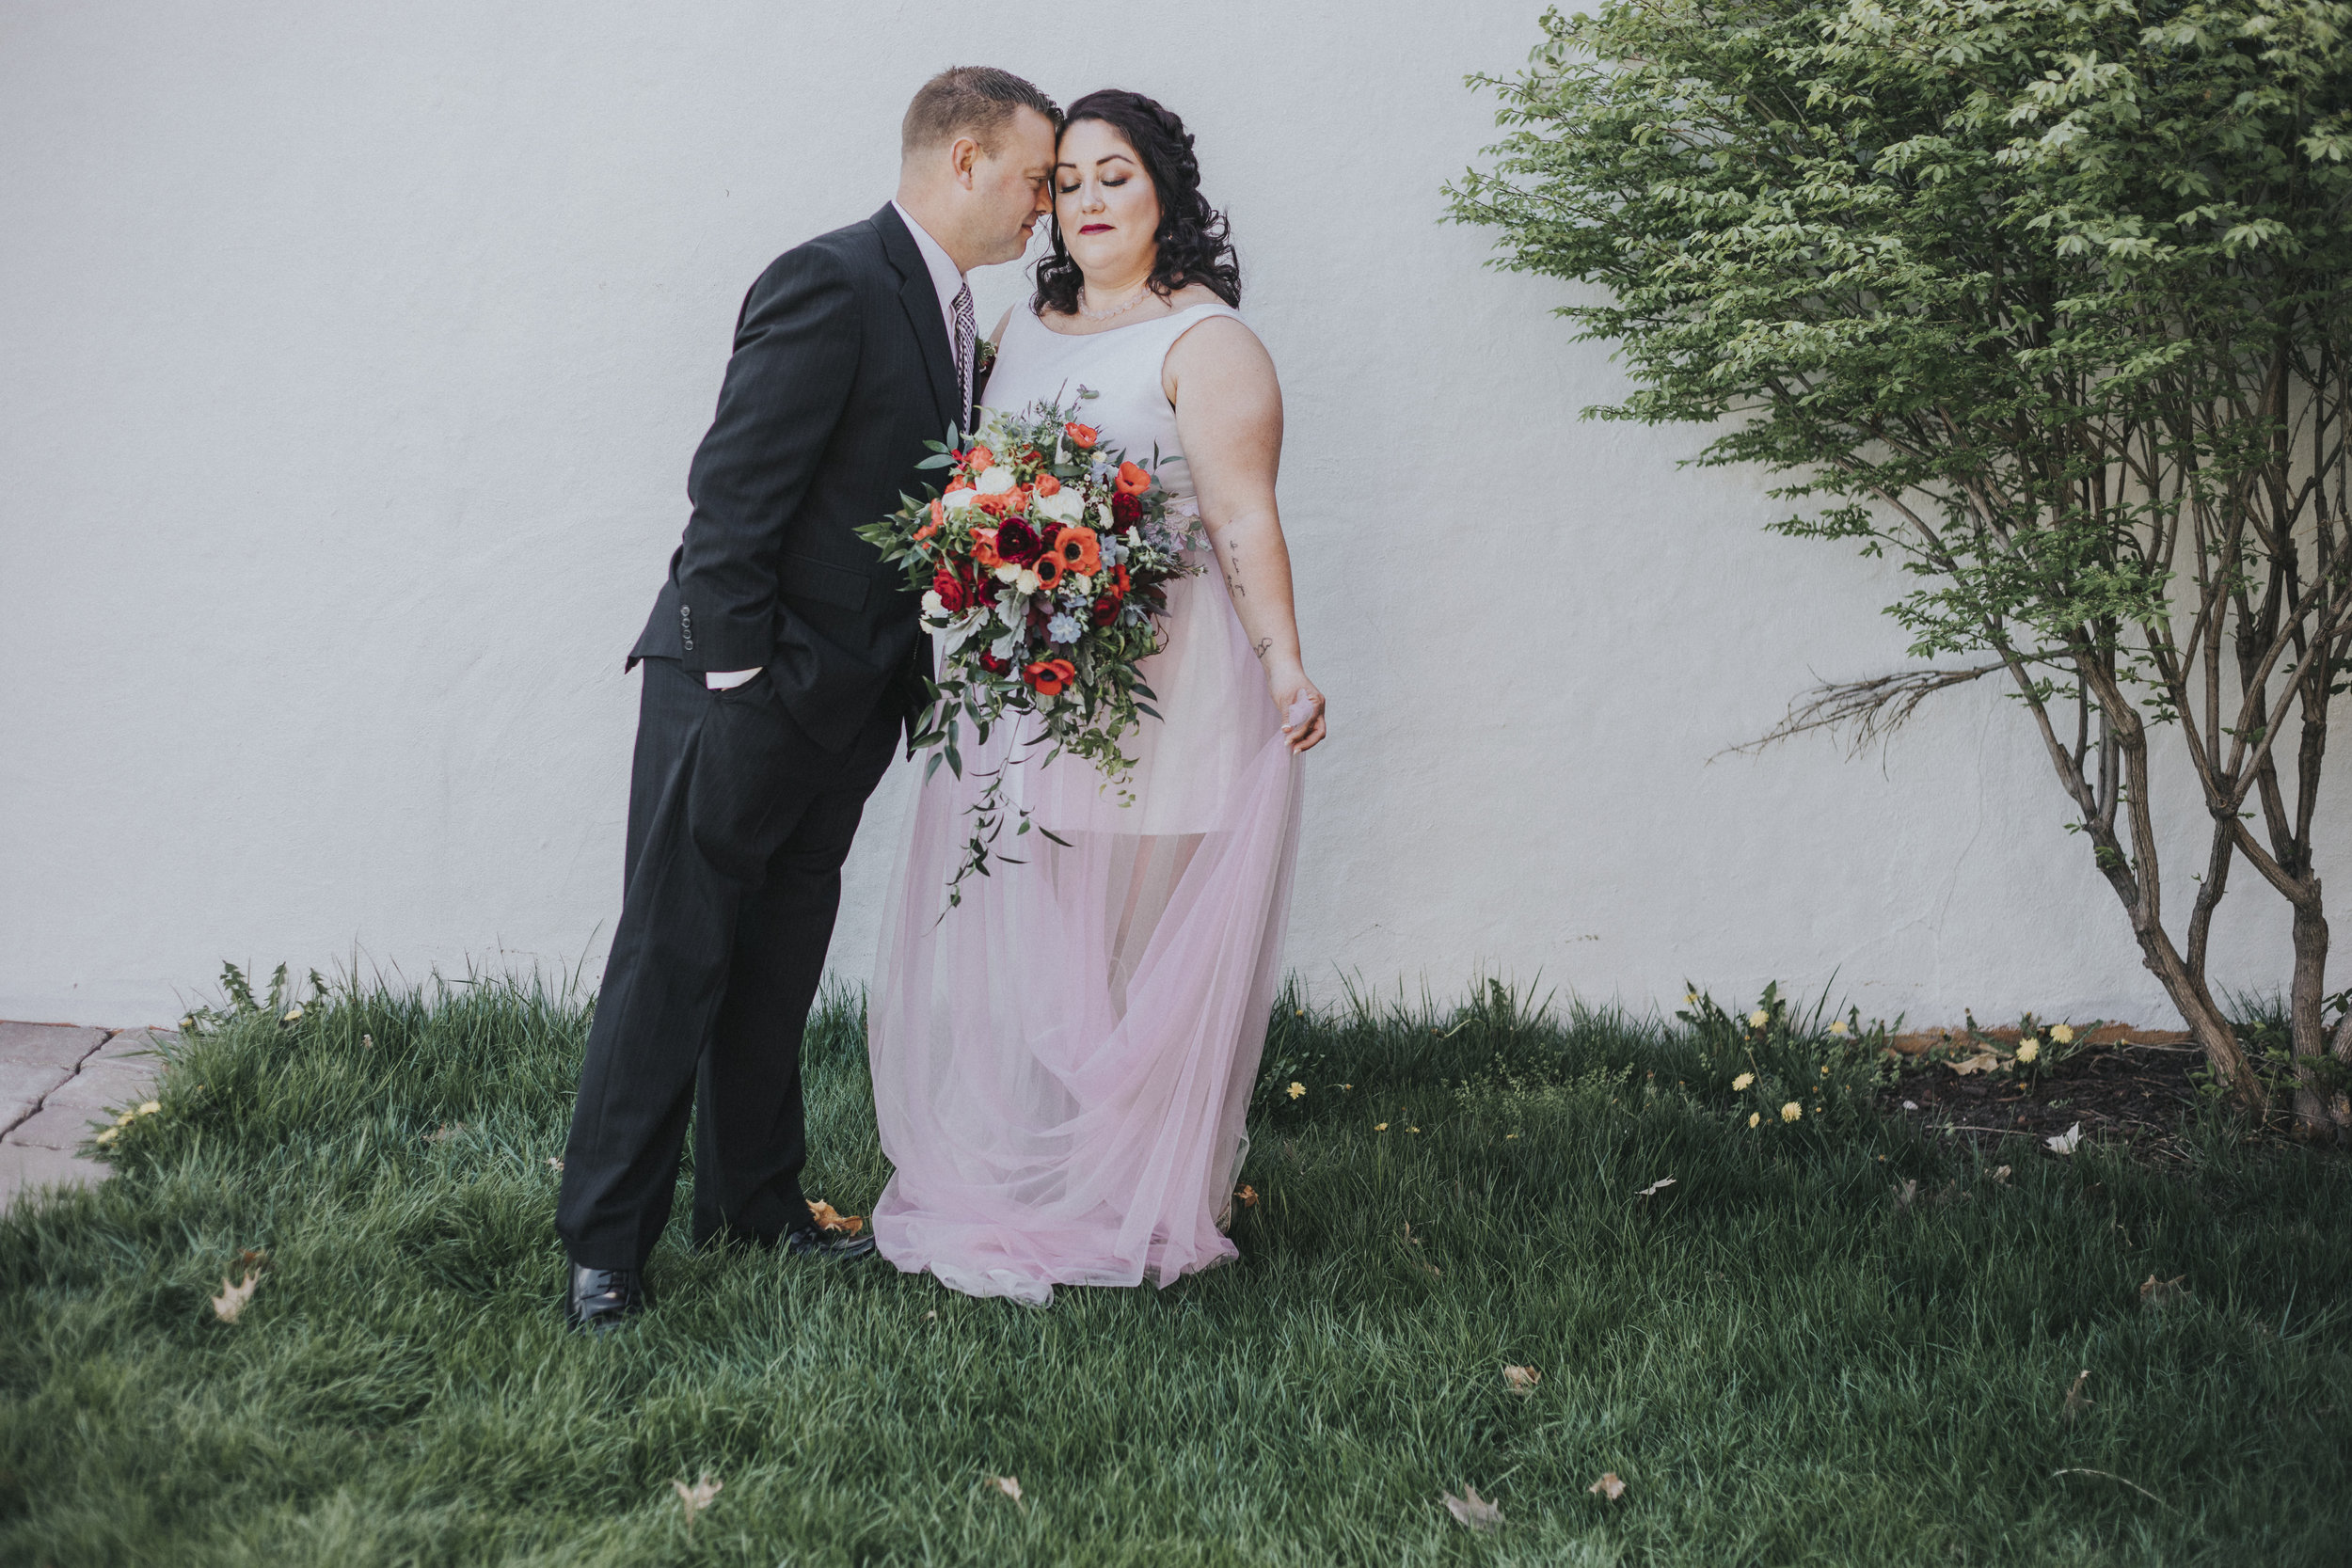 48 midwest-colorado-nebraska-elopement-photography-gretna-turtledoves.jpg